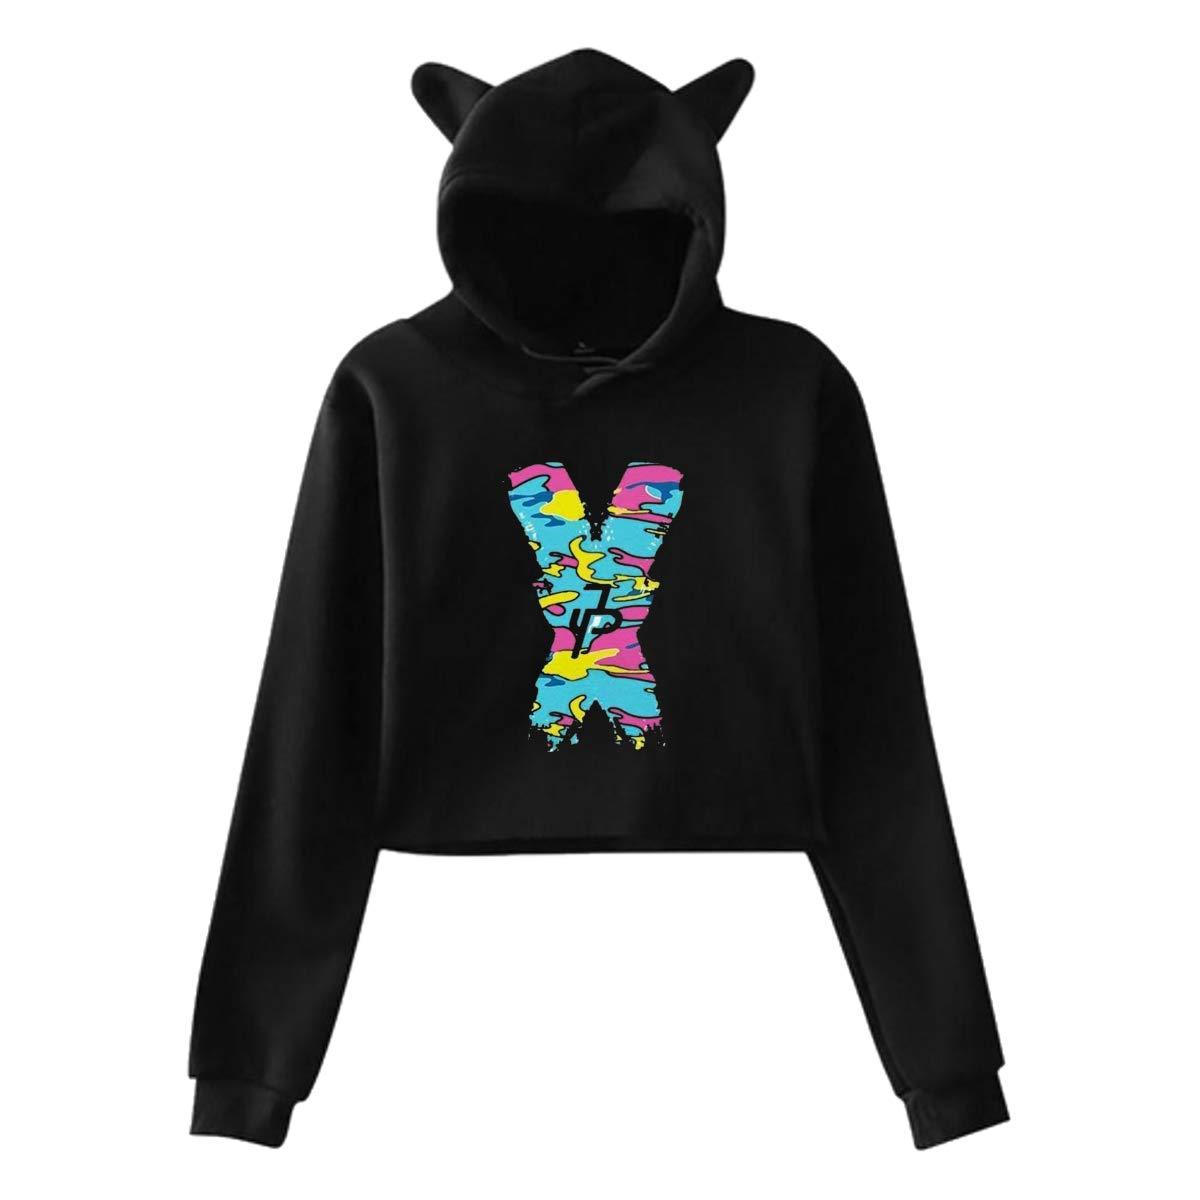 Womens Cat Ear Pullover Hoodie Jake Paul X JP Hooded Sweatshirt Hoodies for Women Girls Clothes Outdoor Sport Coat Tops Black 29